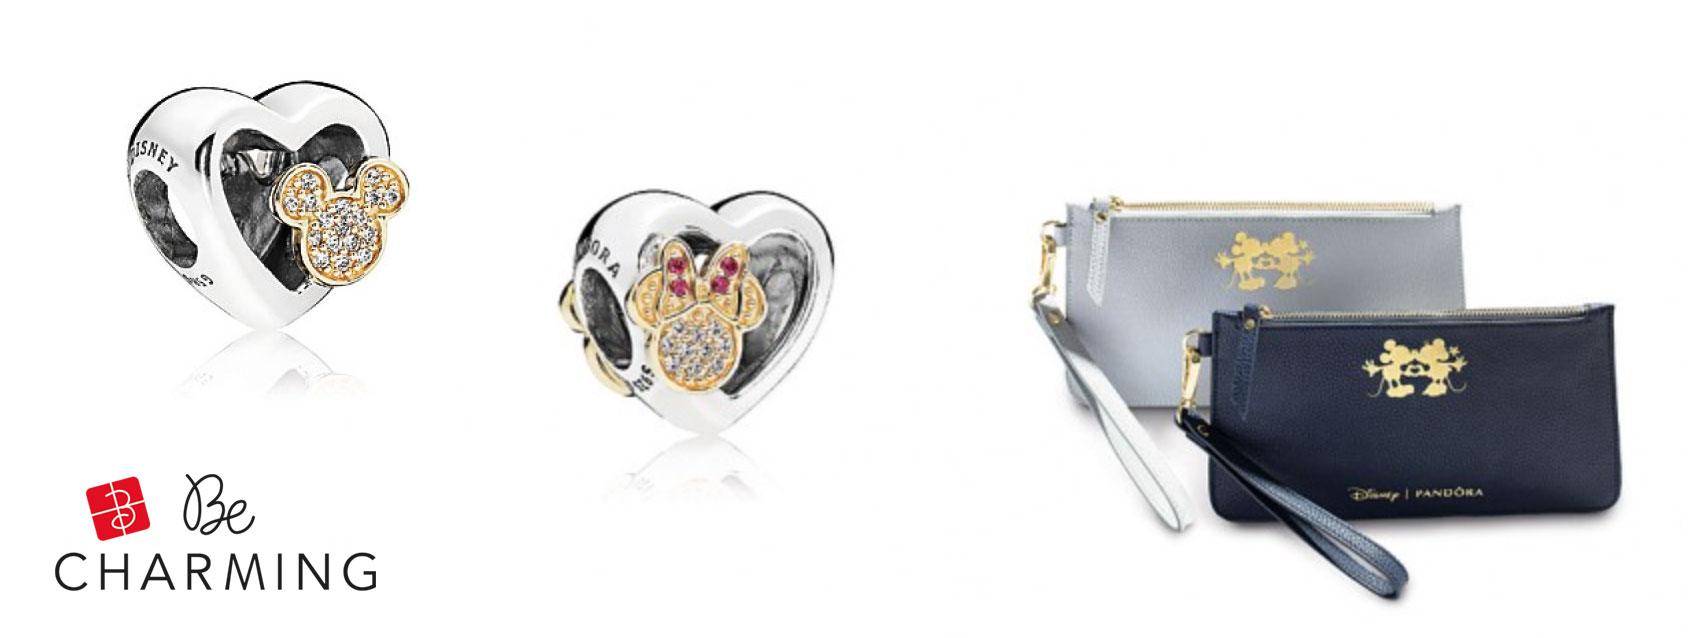 79749fcaa becharming-pandora-disney-love-icon-clutch - The Art of Pandora ...